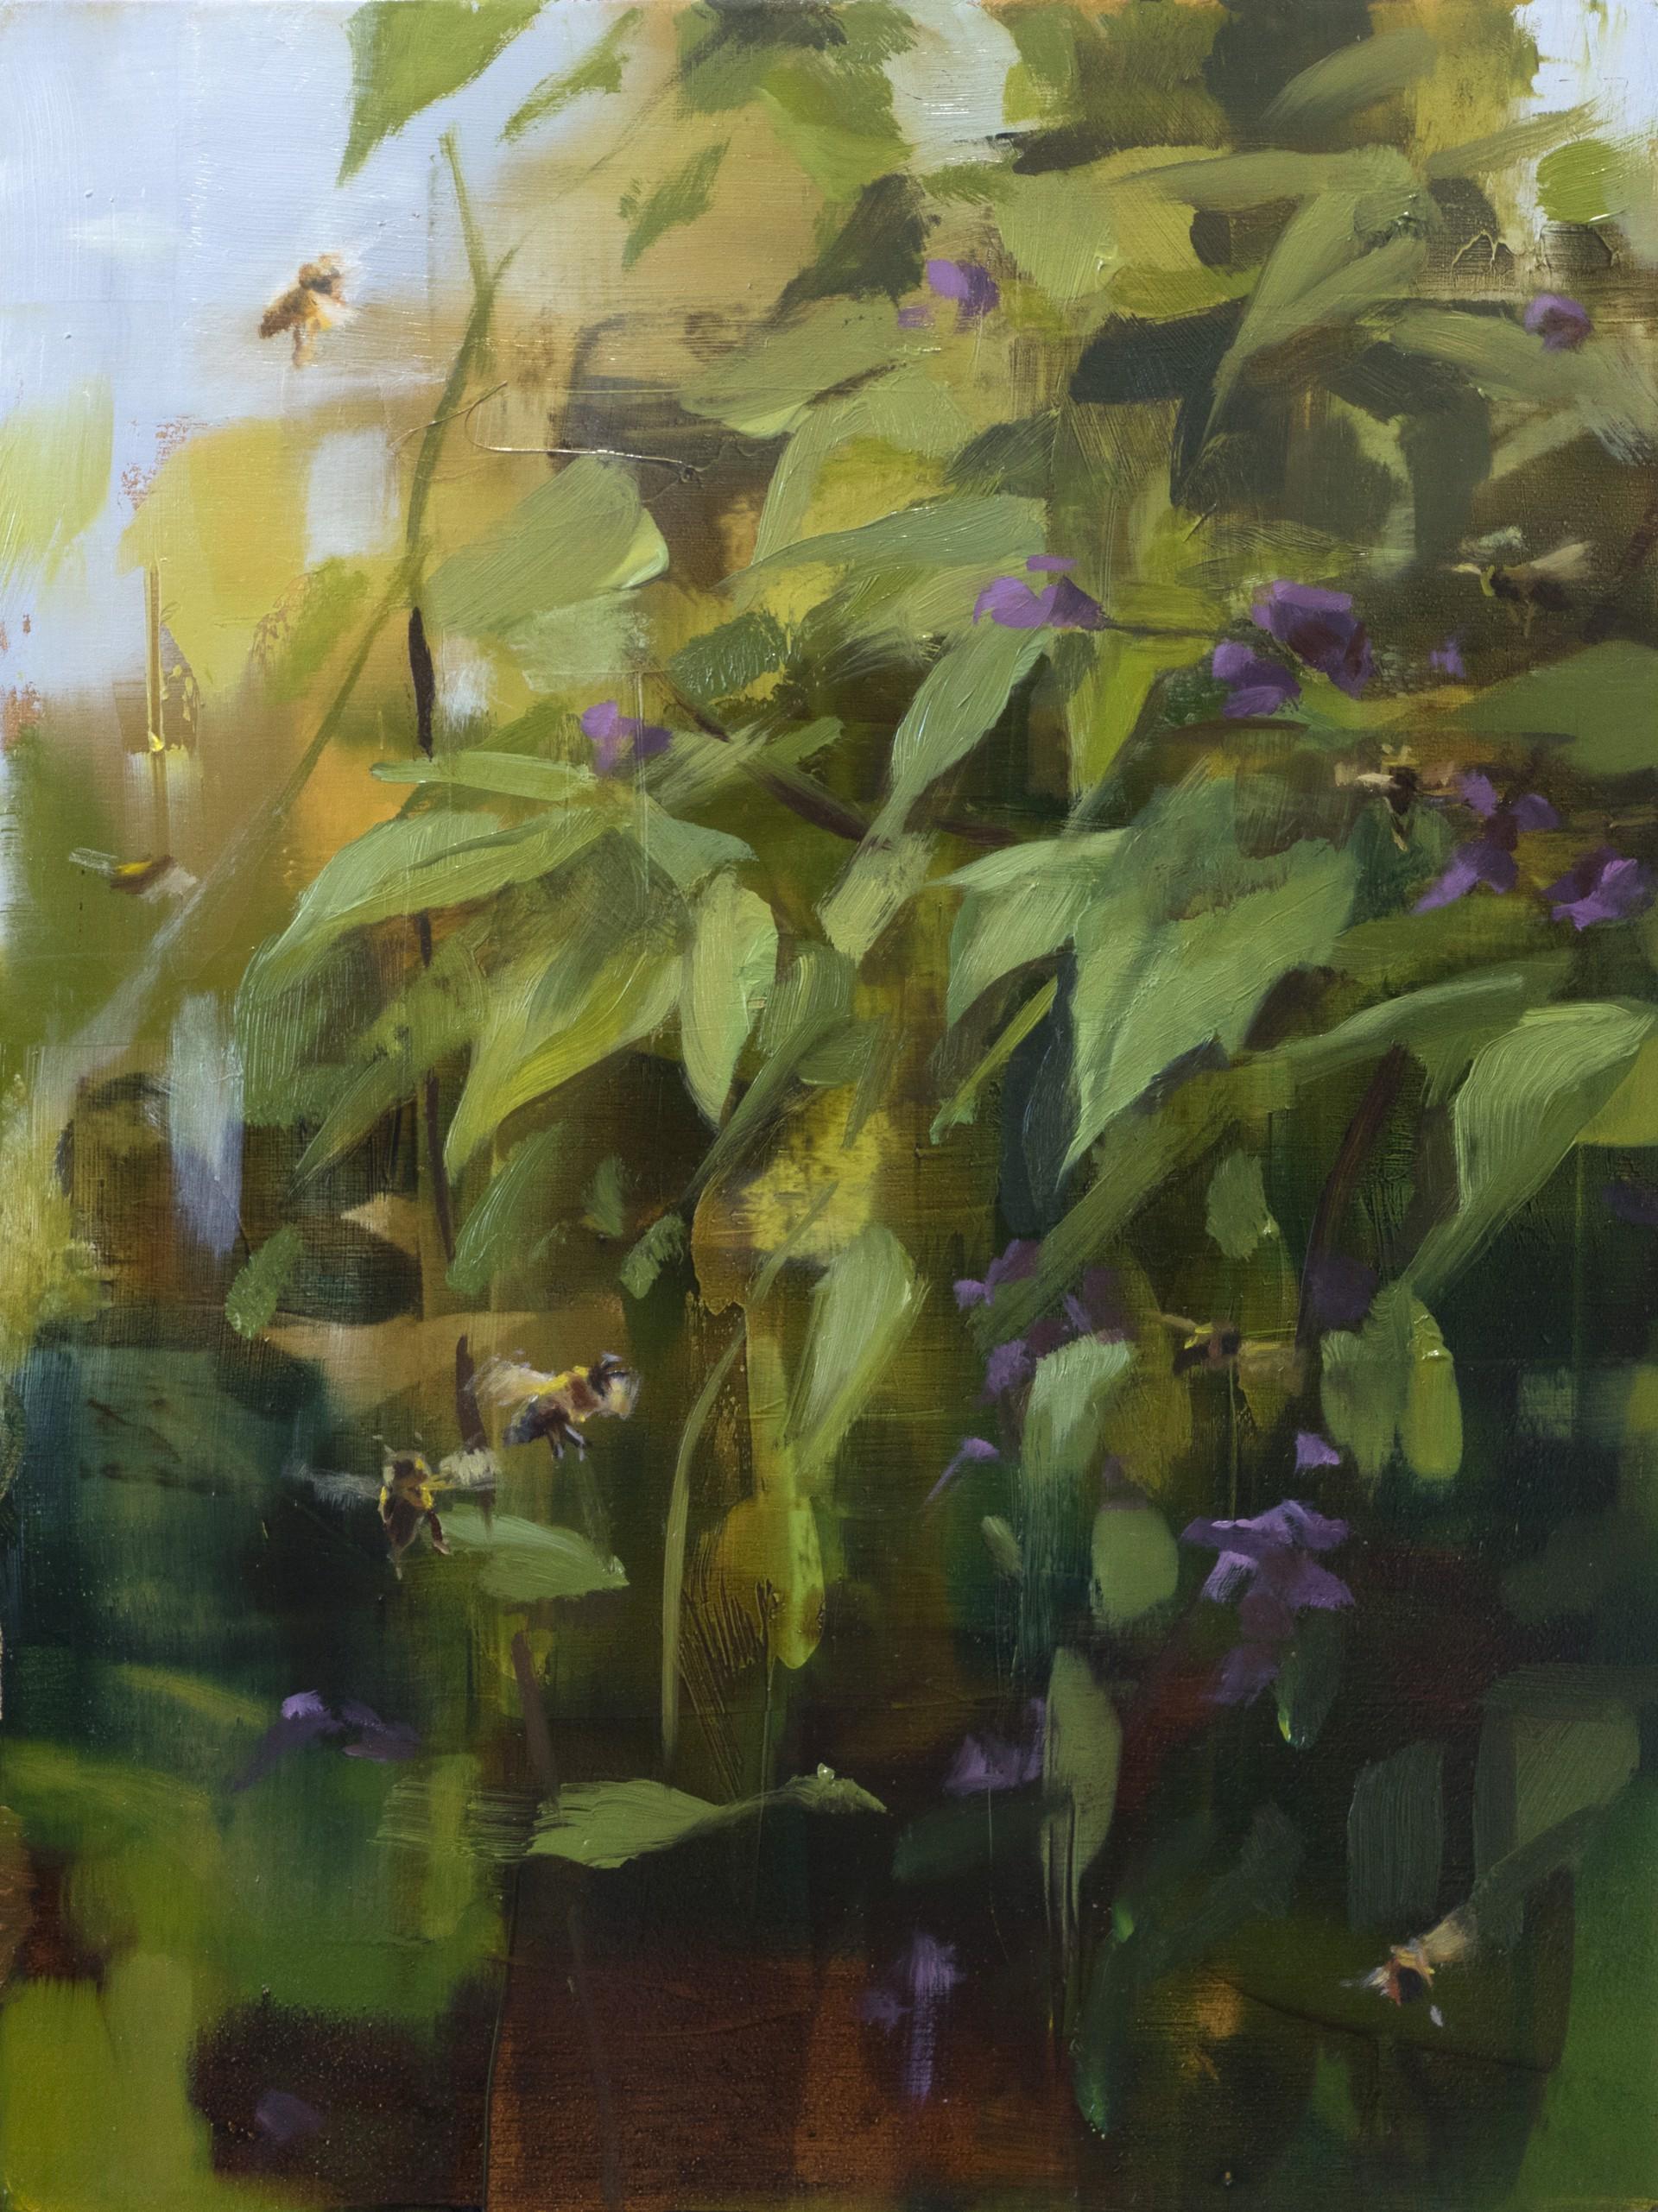 Bramble by Robin Cole